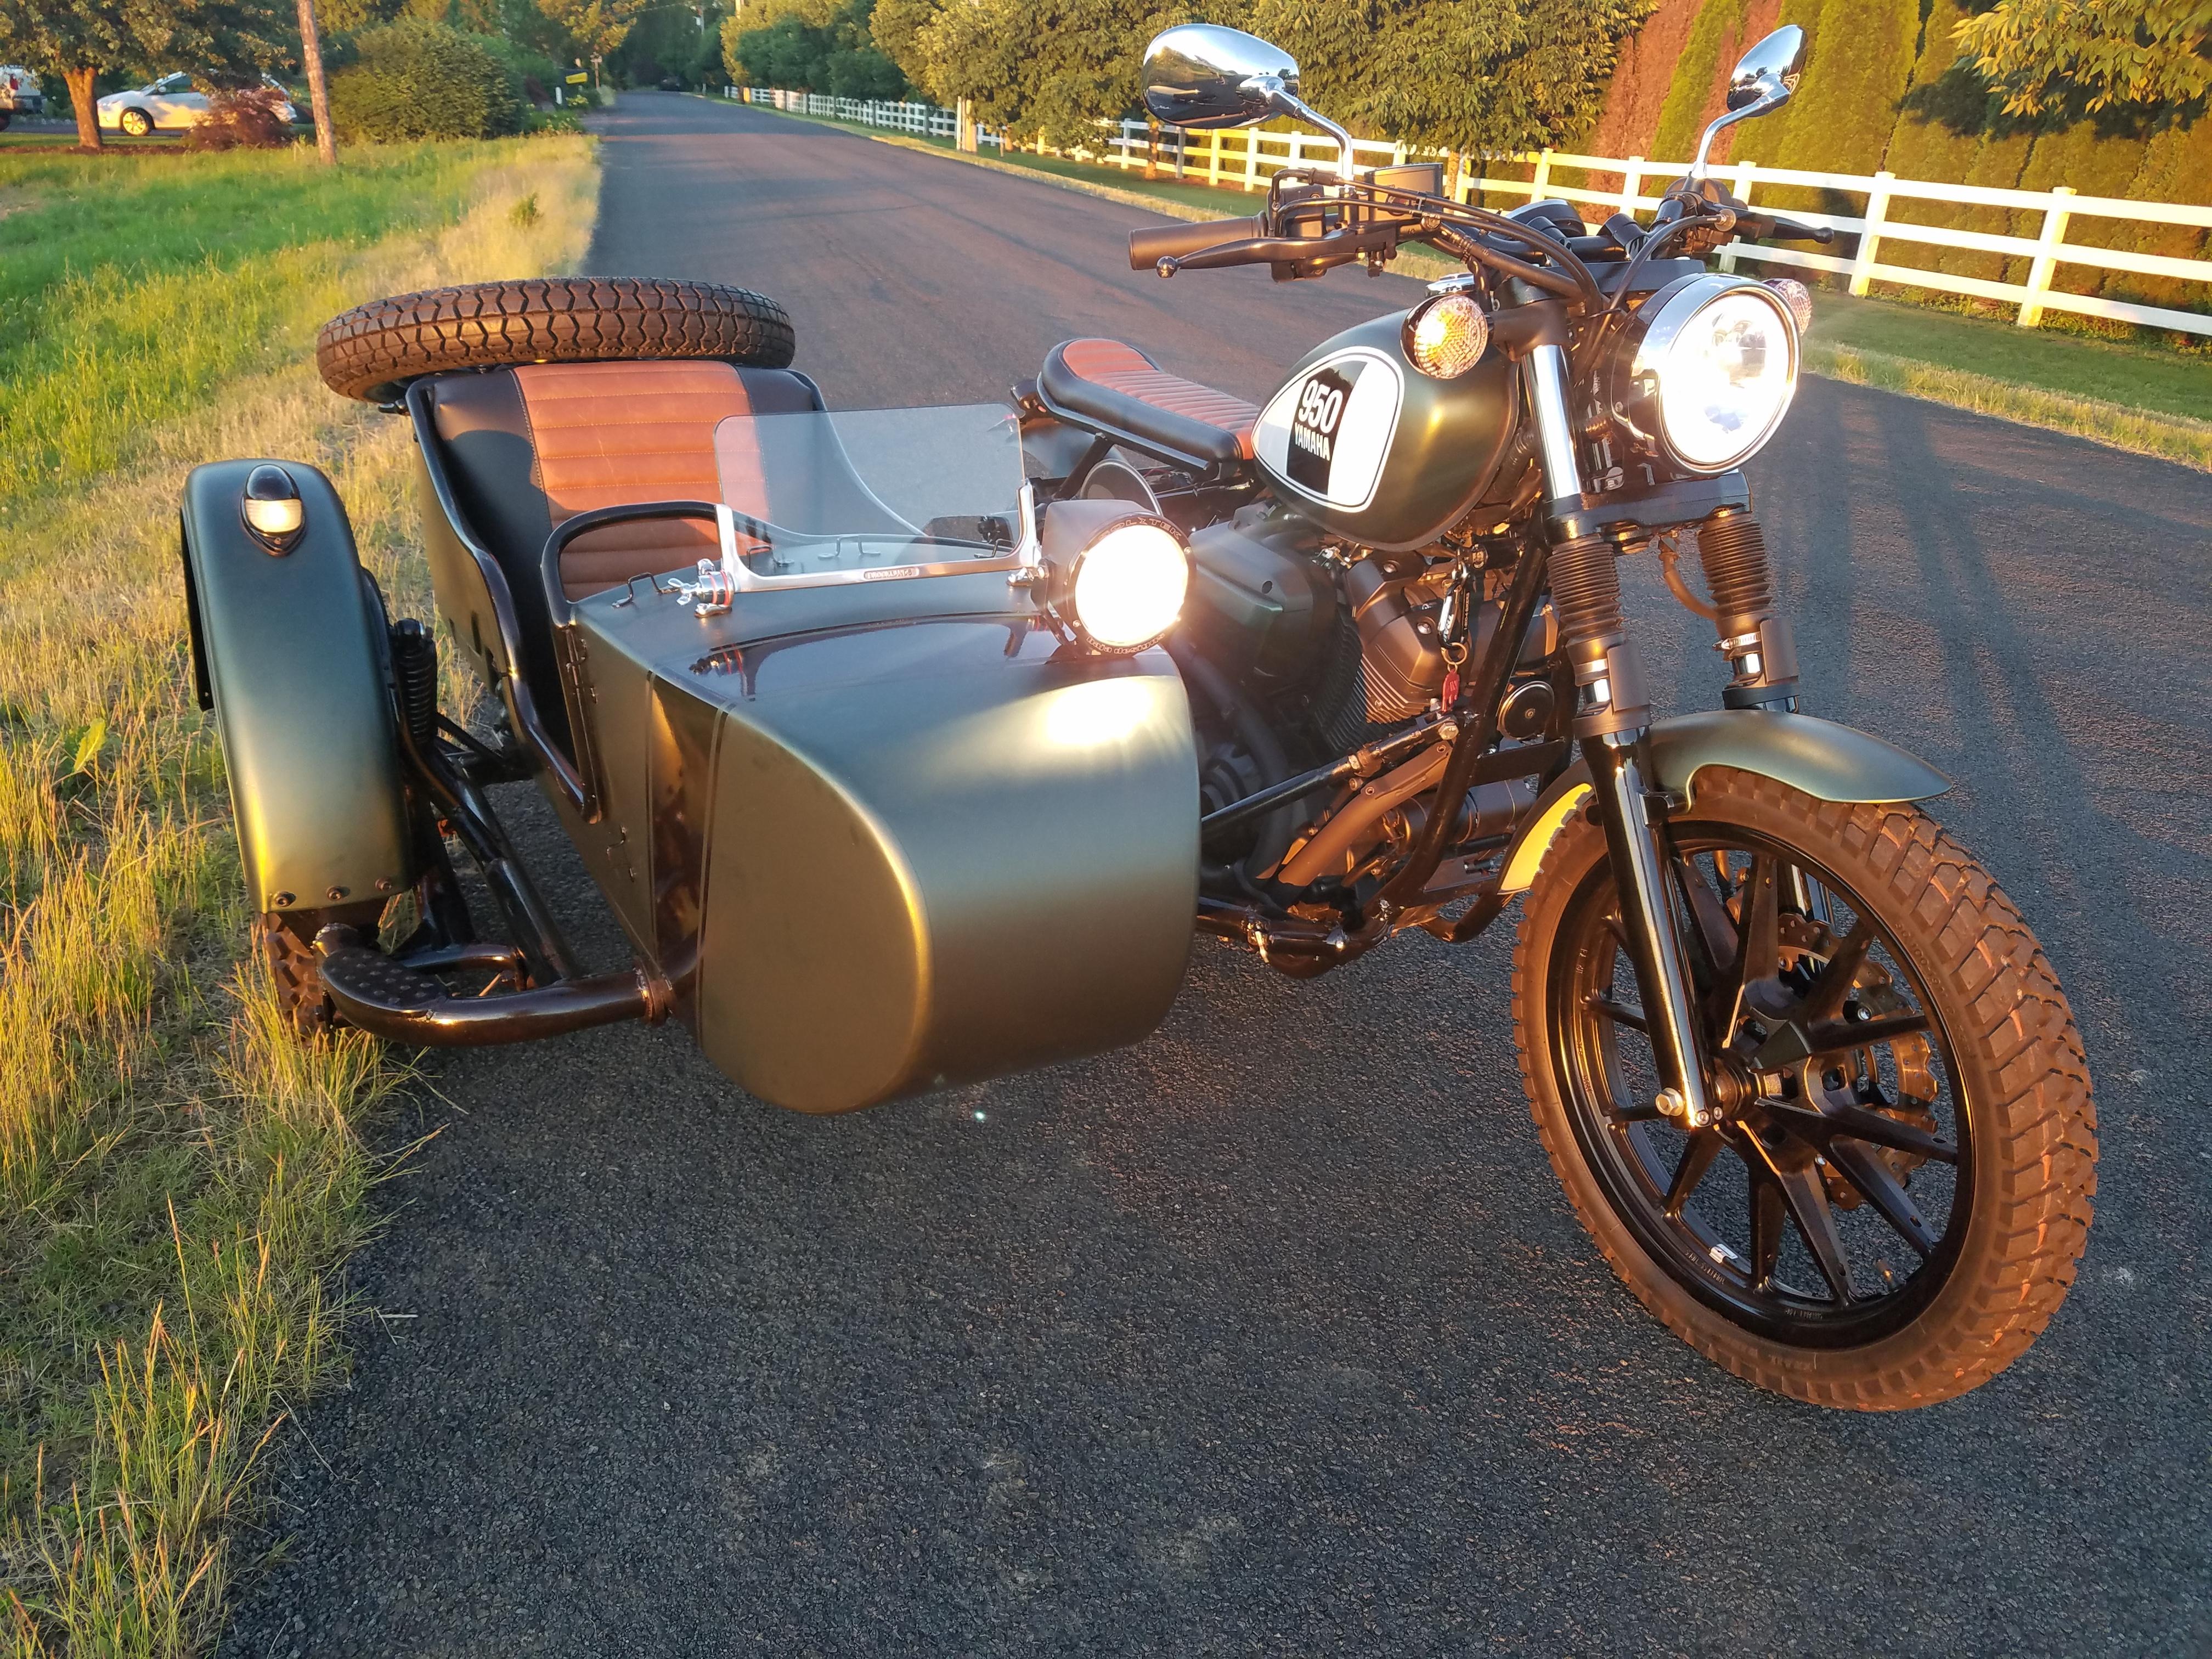 Custom Sidecar Yamaha 950 Bolt Scrambler w Ural – Save On Fun